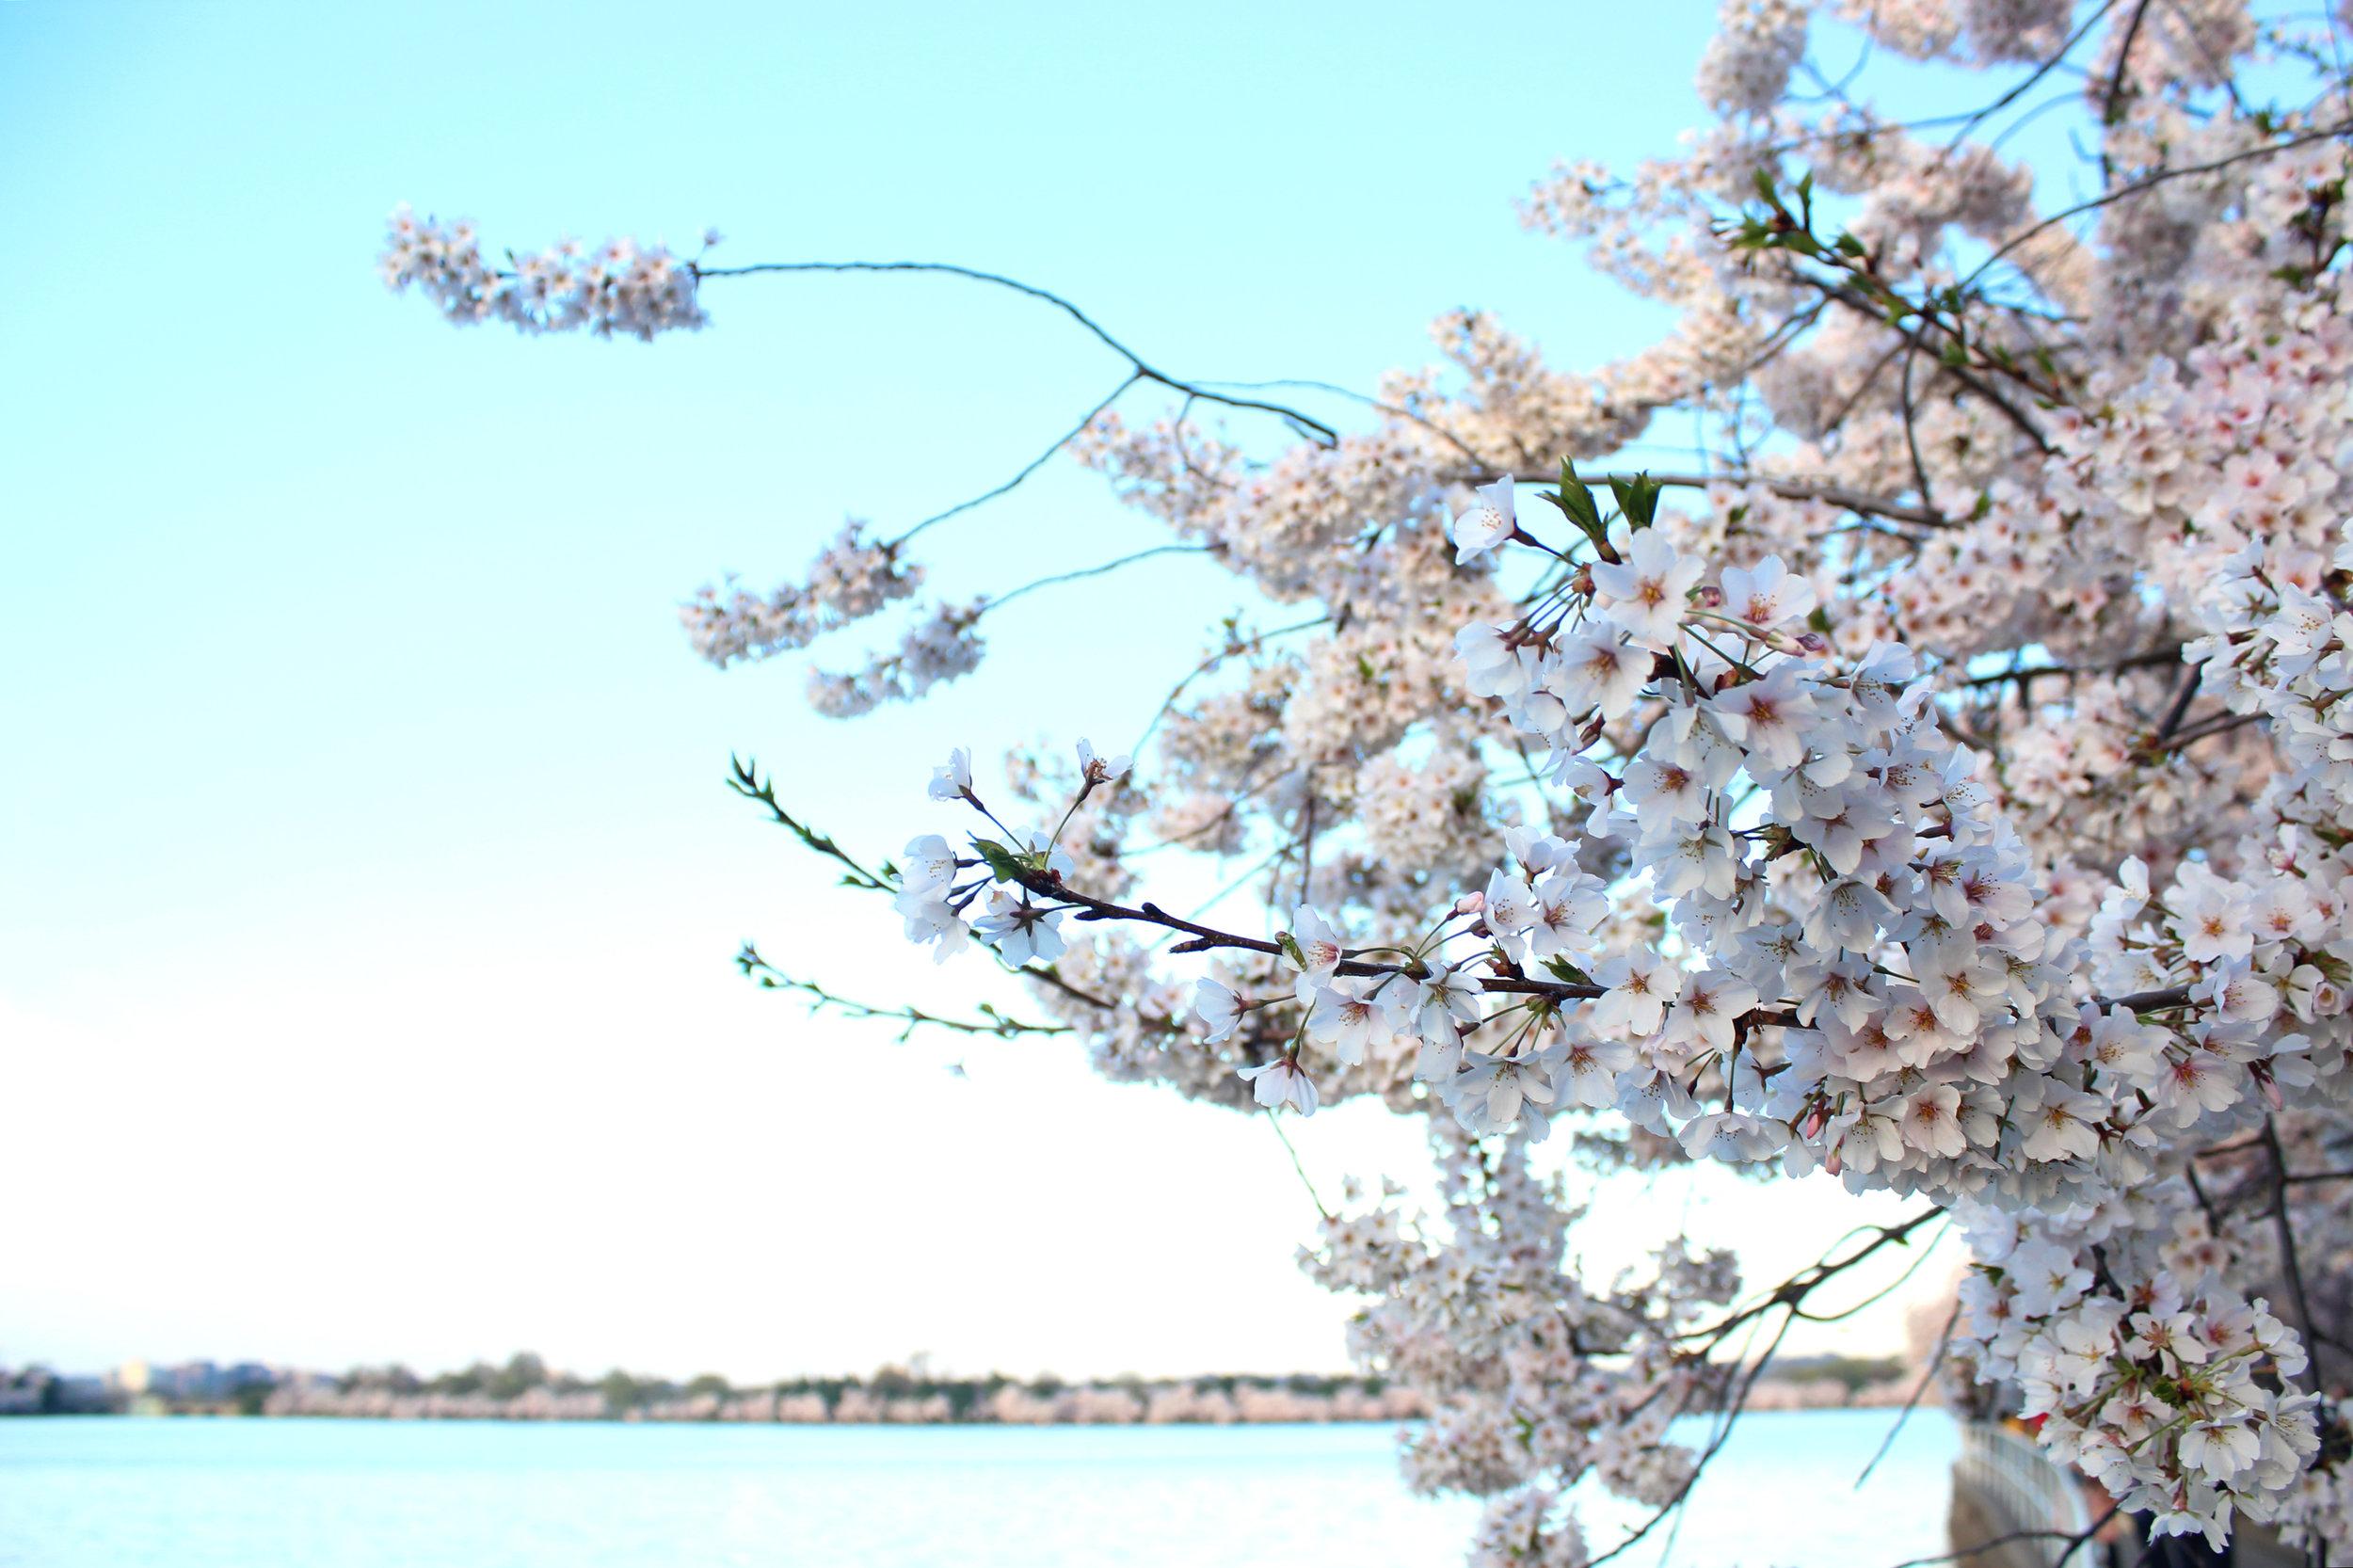 dc-cherry-blossoms-nora-knox.jpg